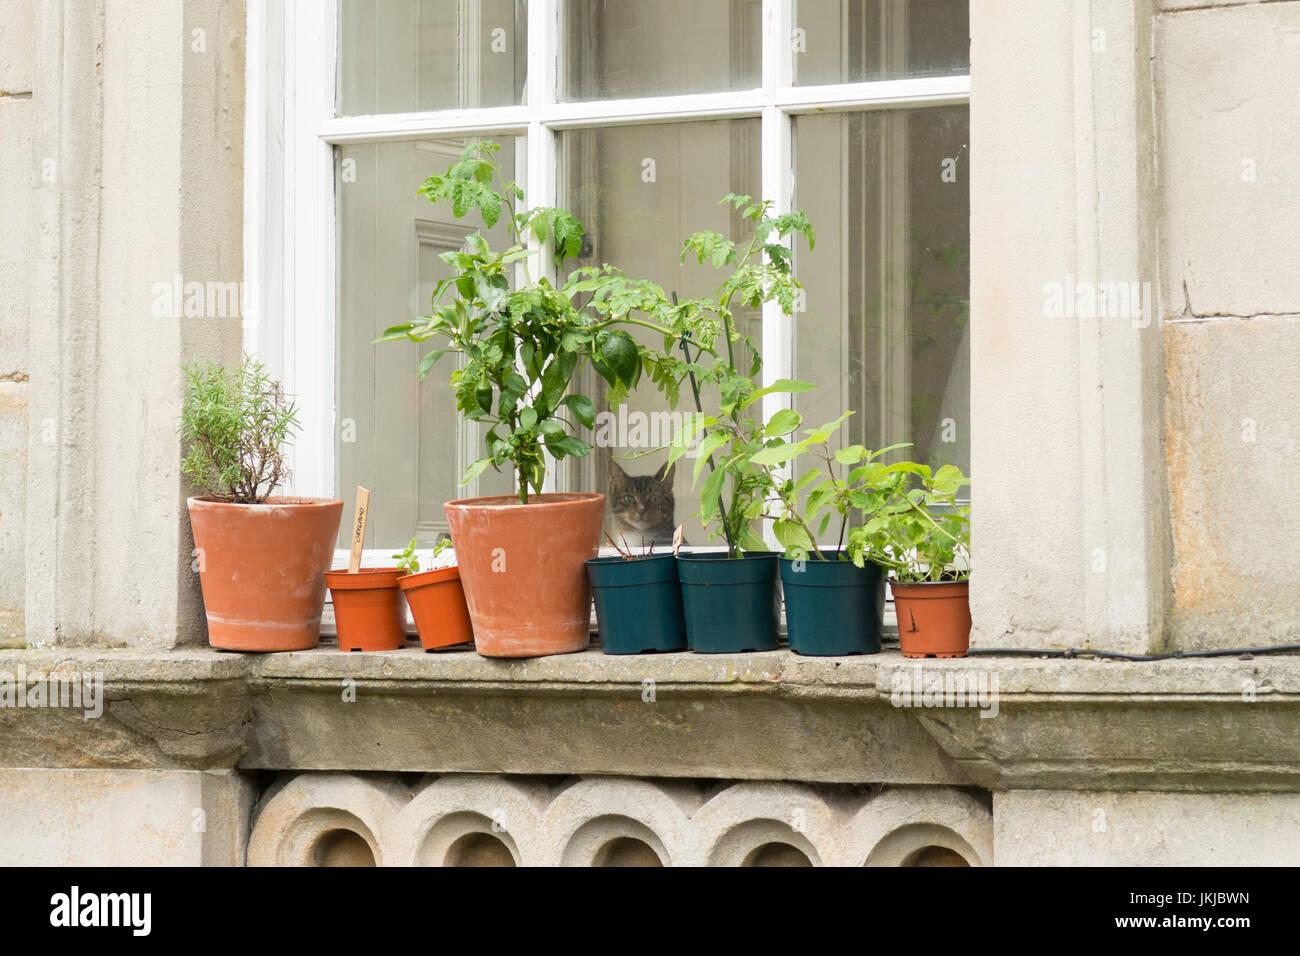 Fenster-Kräutergarten mit Katze Blick durch Fenster - uk Stockbild